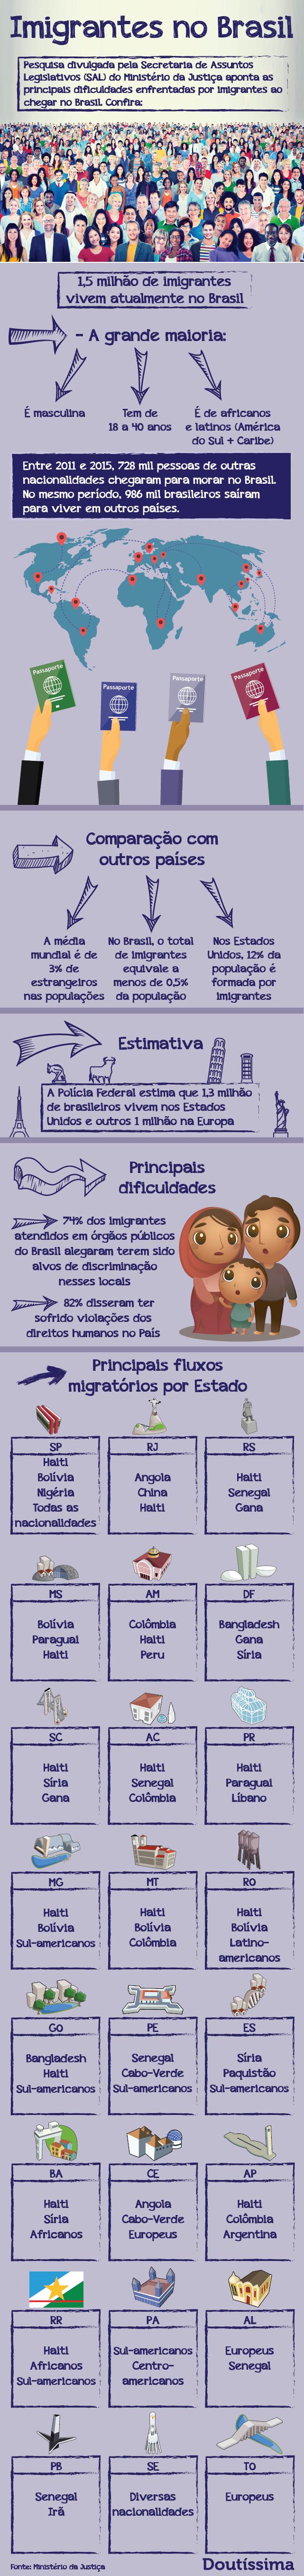 infográfico imigrantes doutíssima